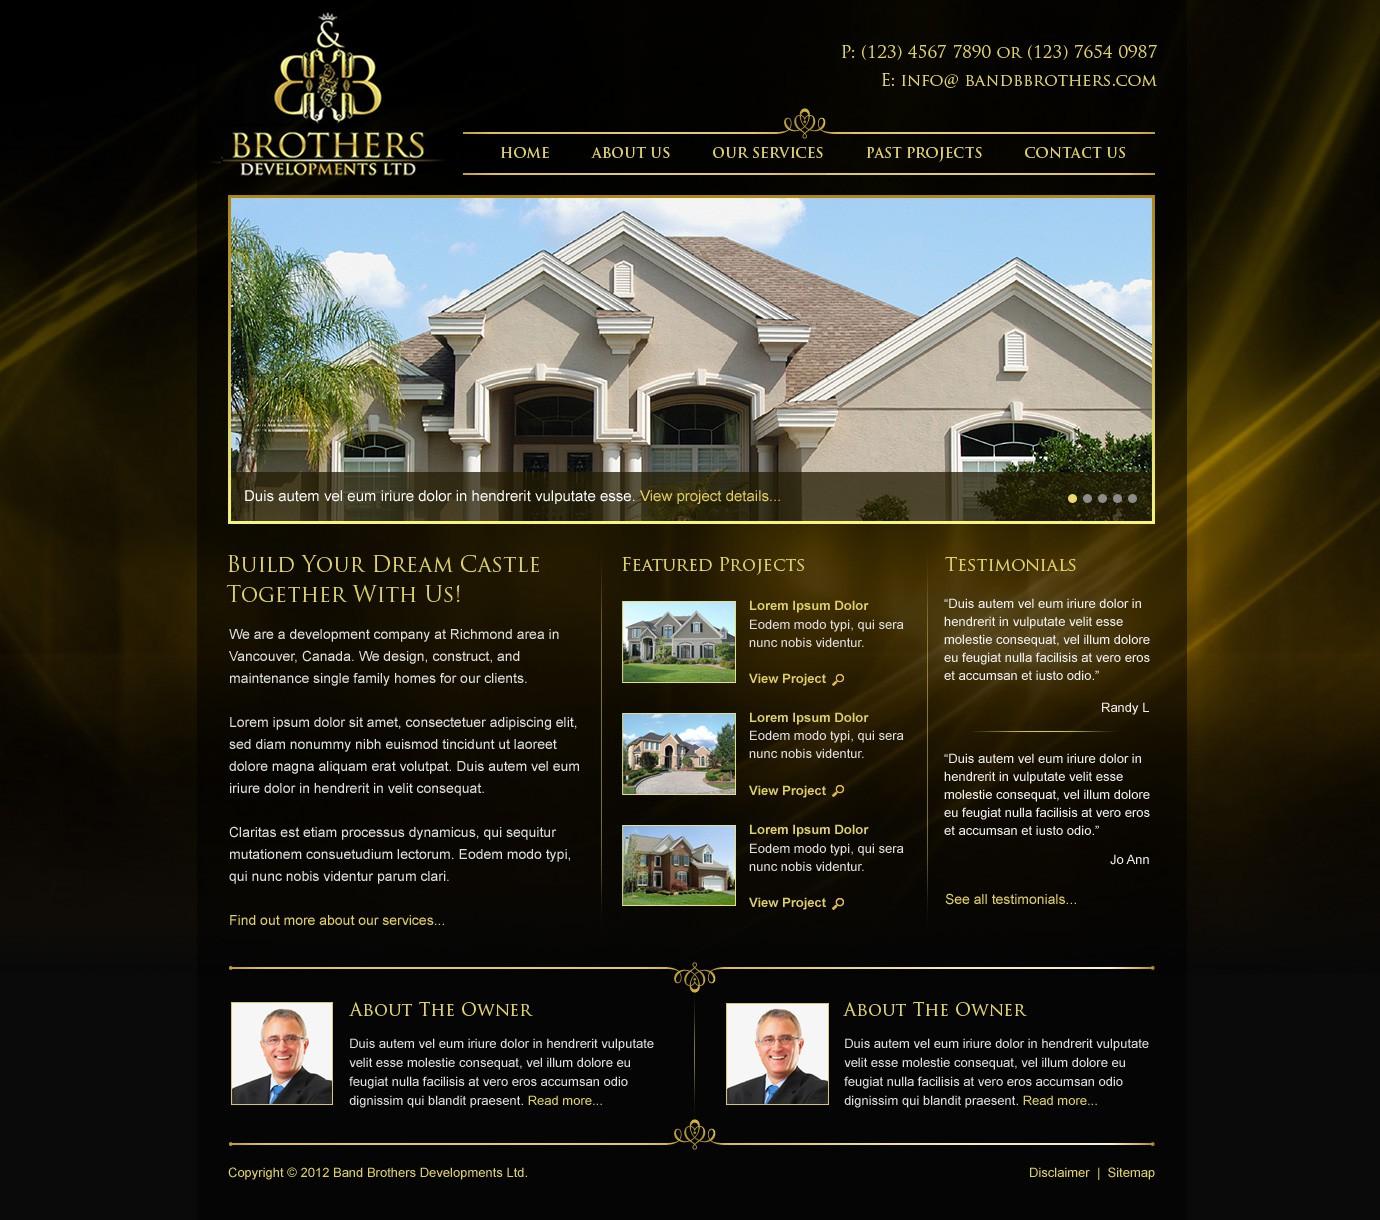 New website design wanted for b&b brothers developments ltd - bandbbrothers.com